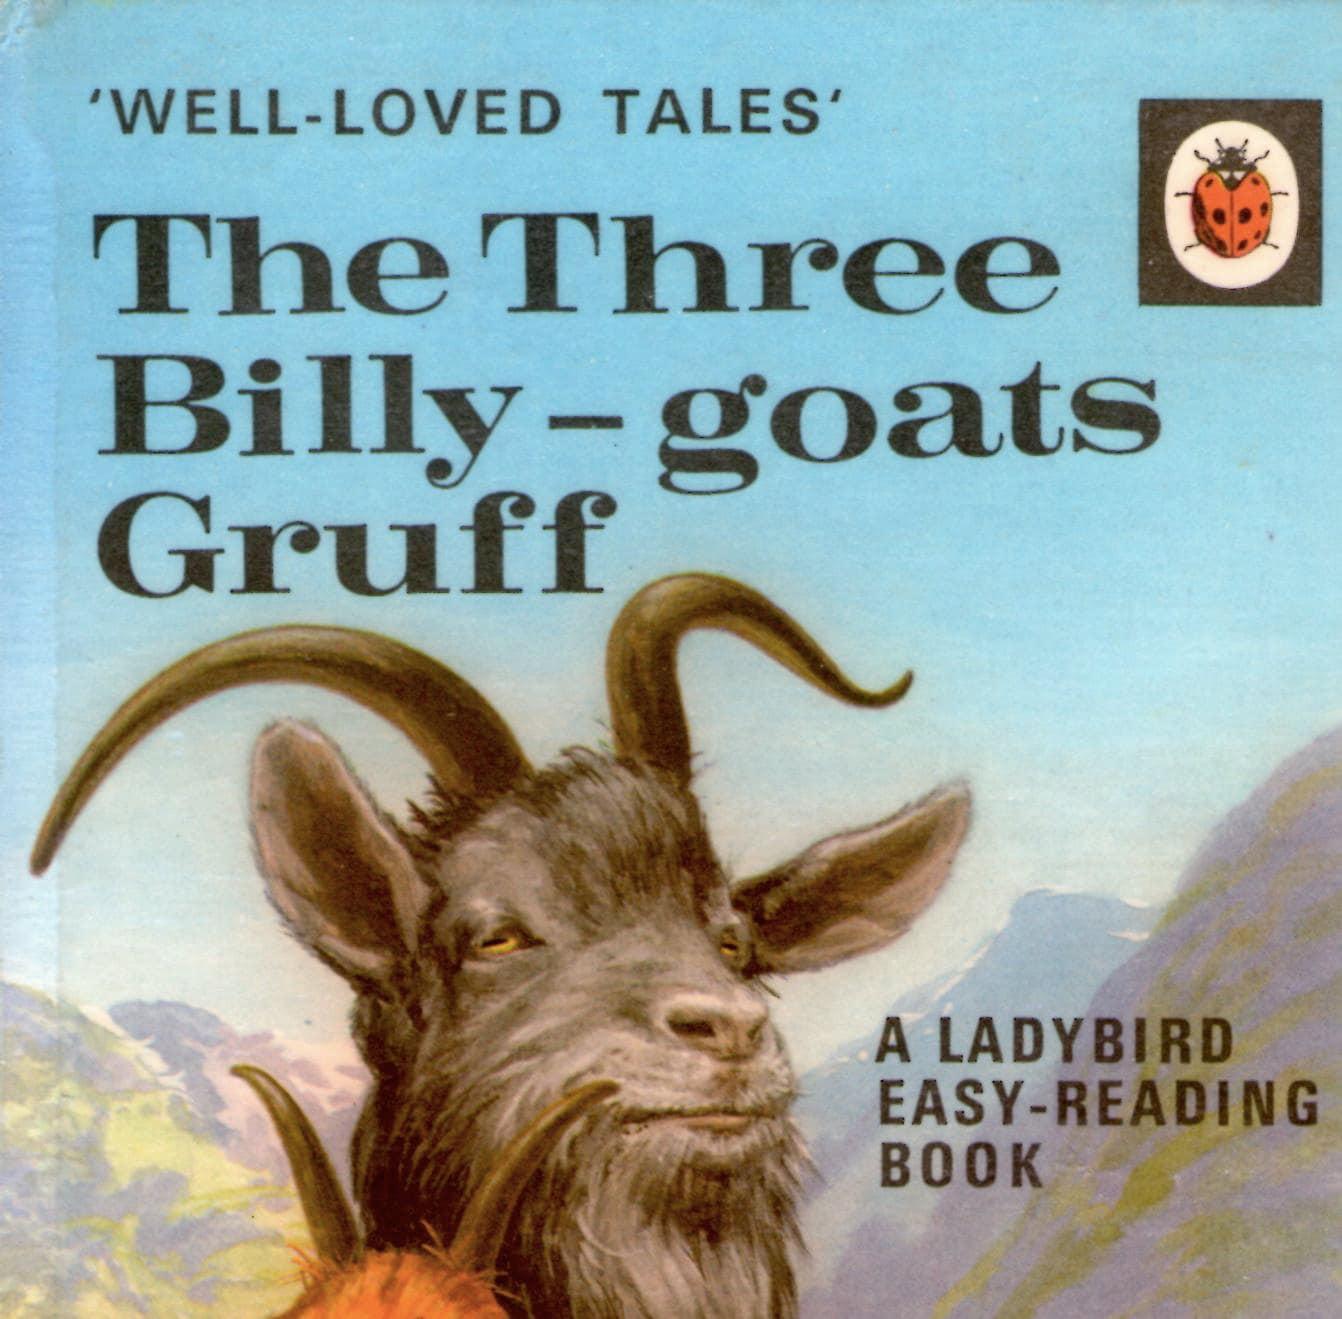 Vintage Ladybird Book The Three Billy Goats Gruff